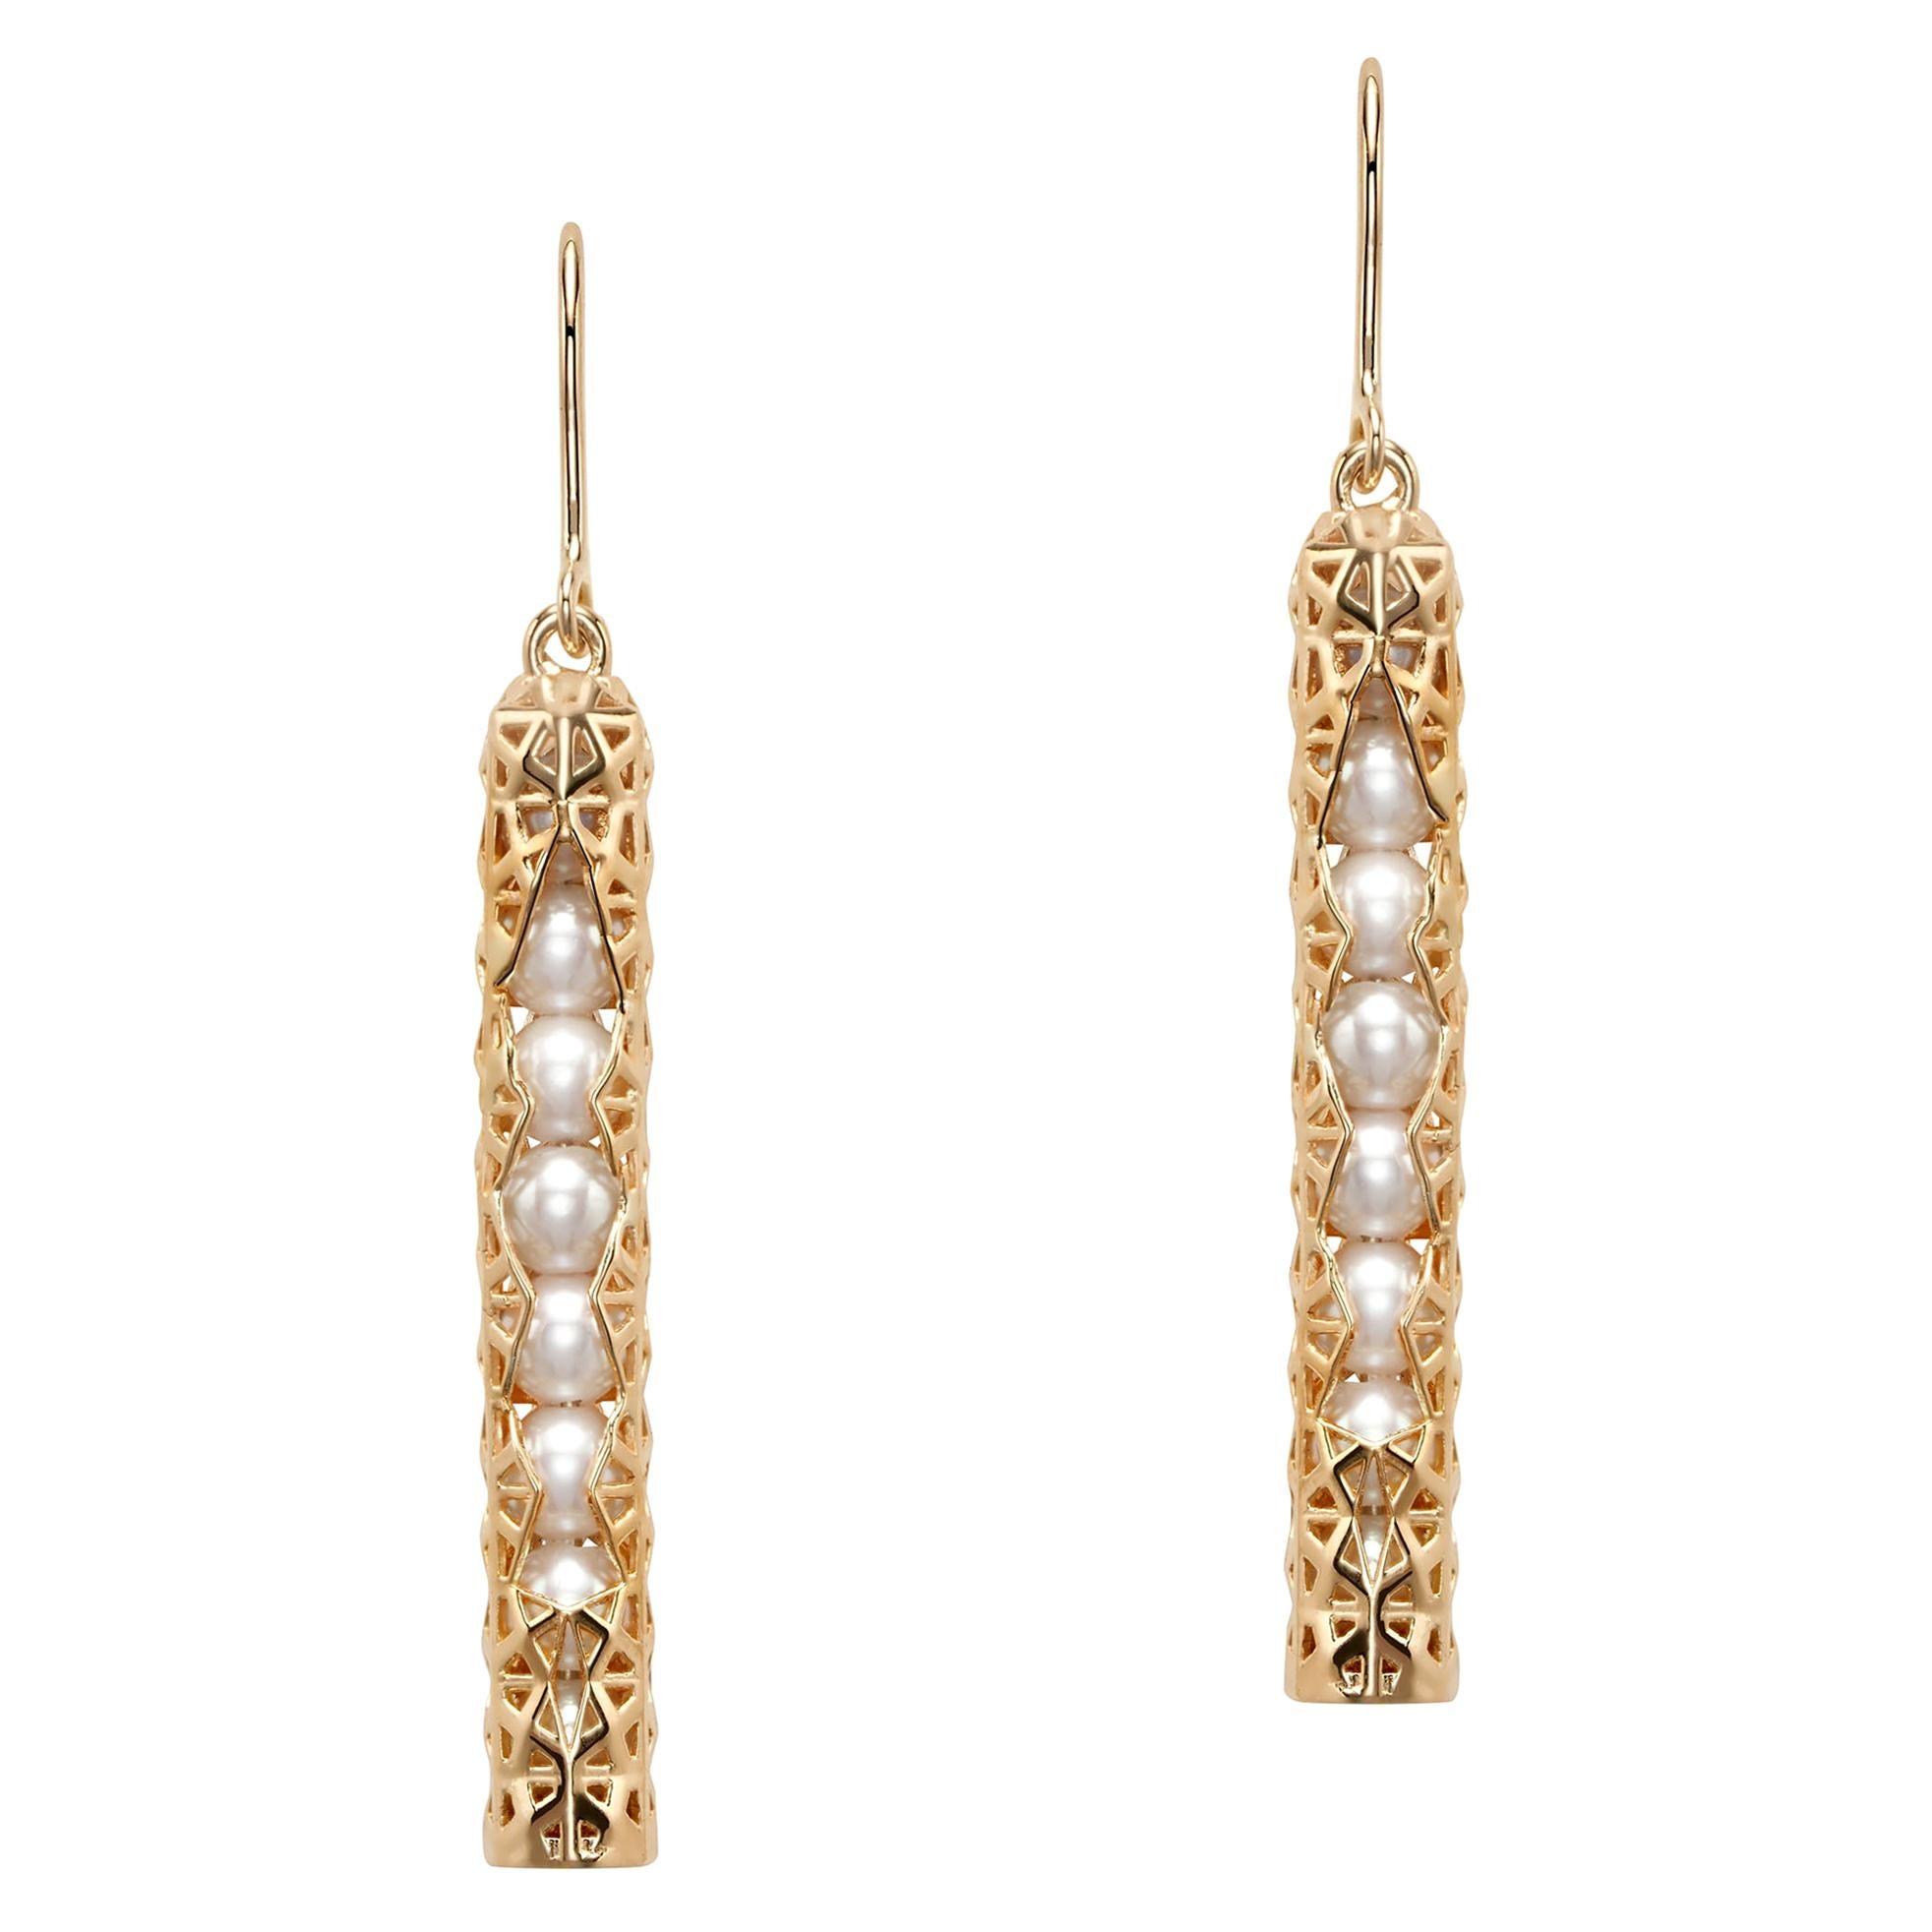 18 Karat Yellow Gold Japanese Akoya Pearls Geometric Hoop Earrings